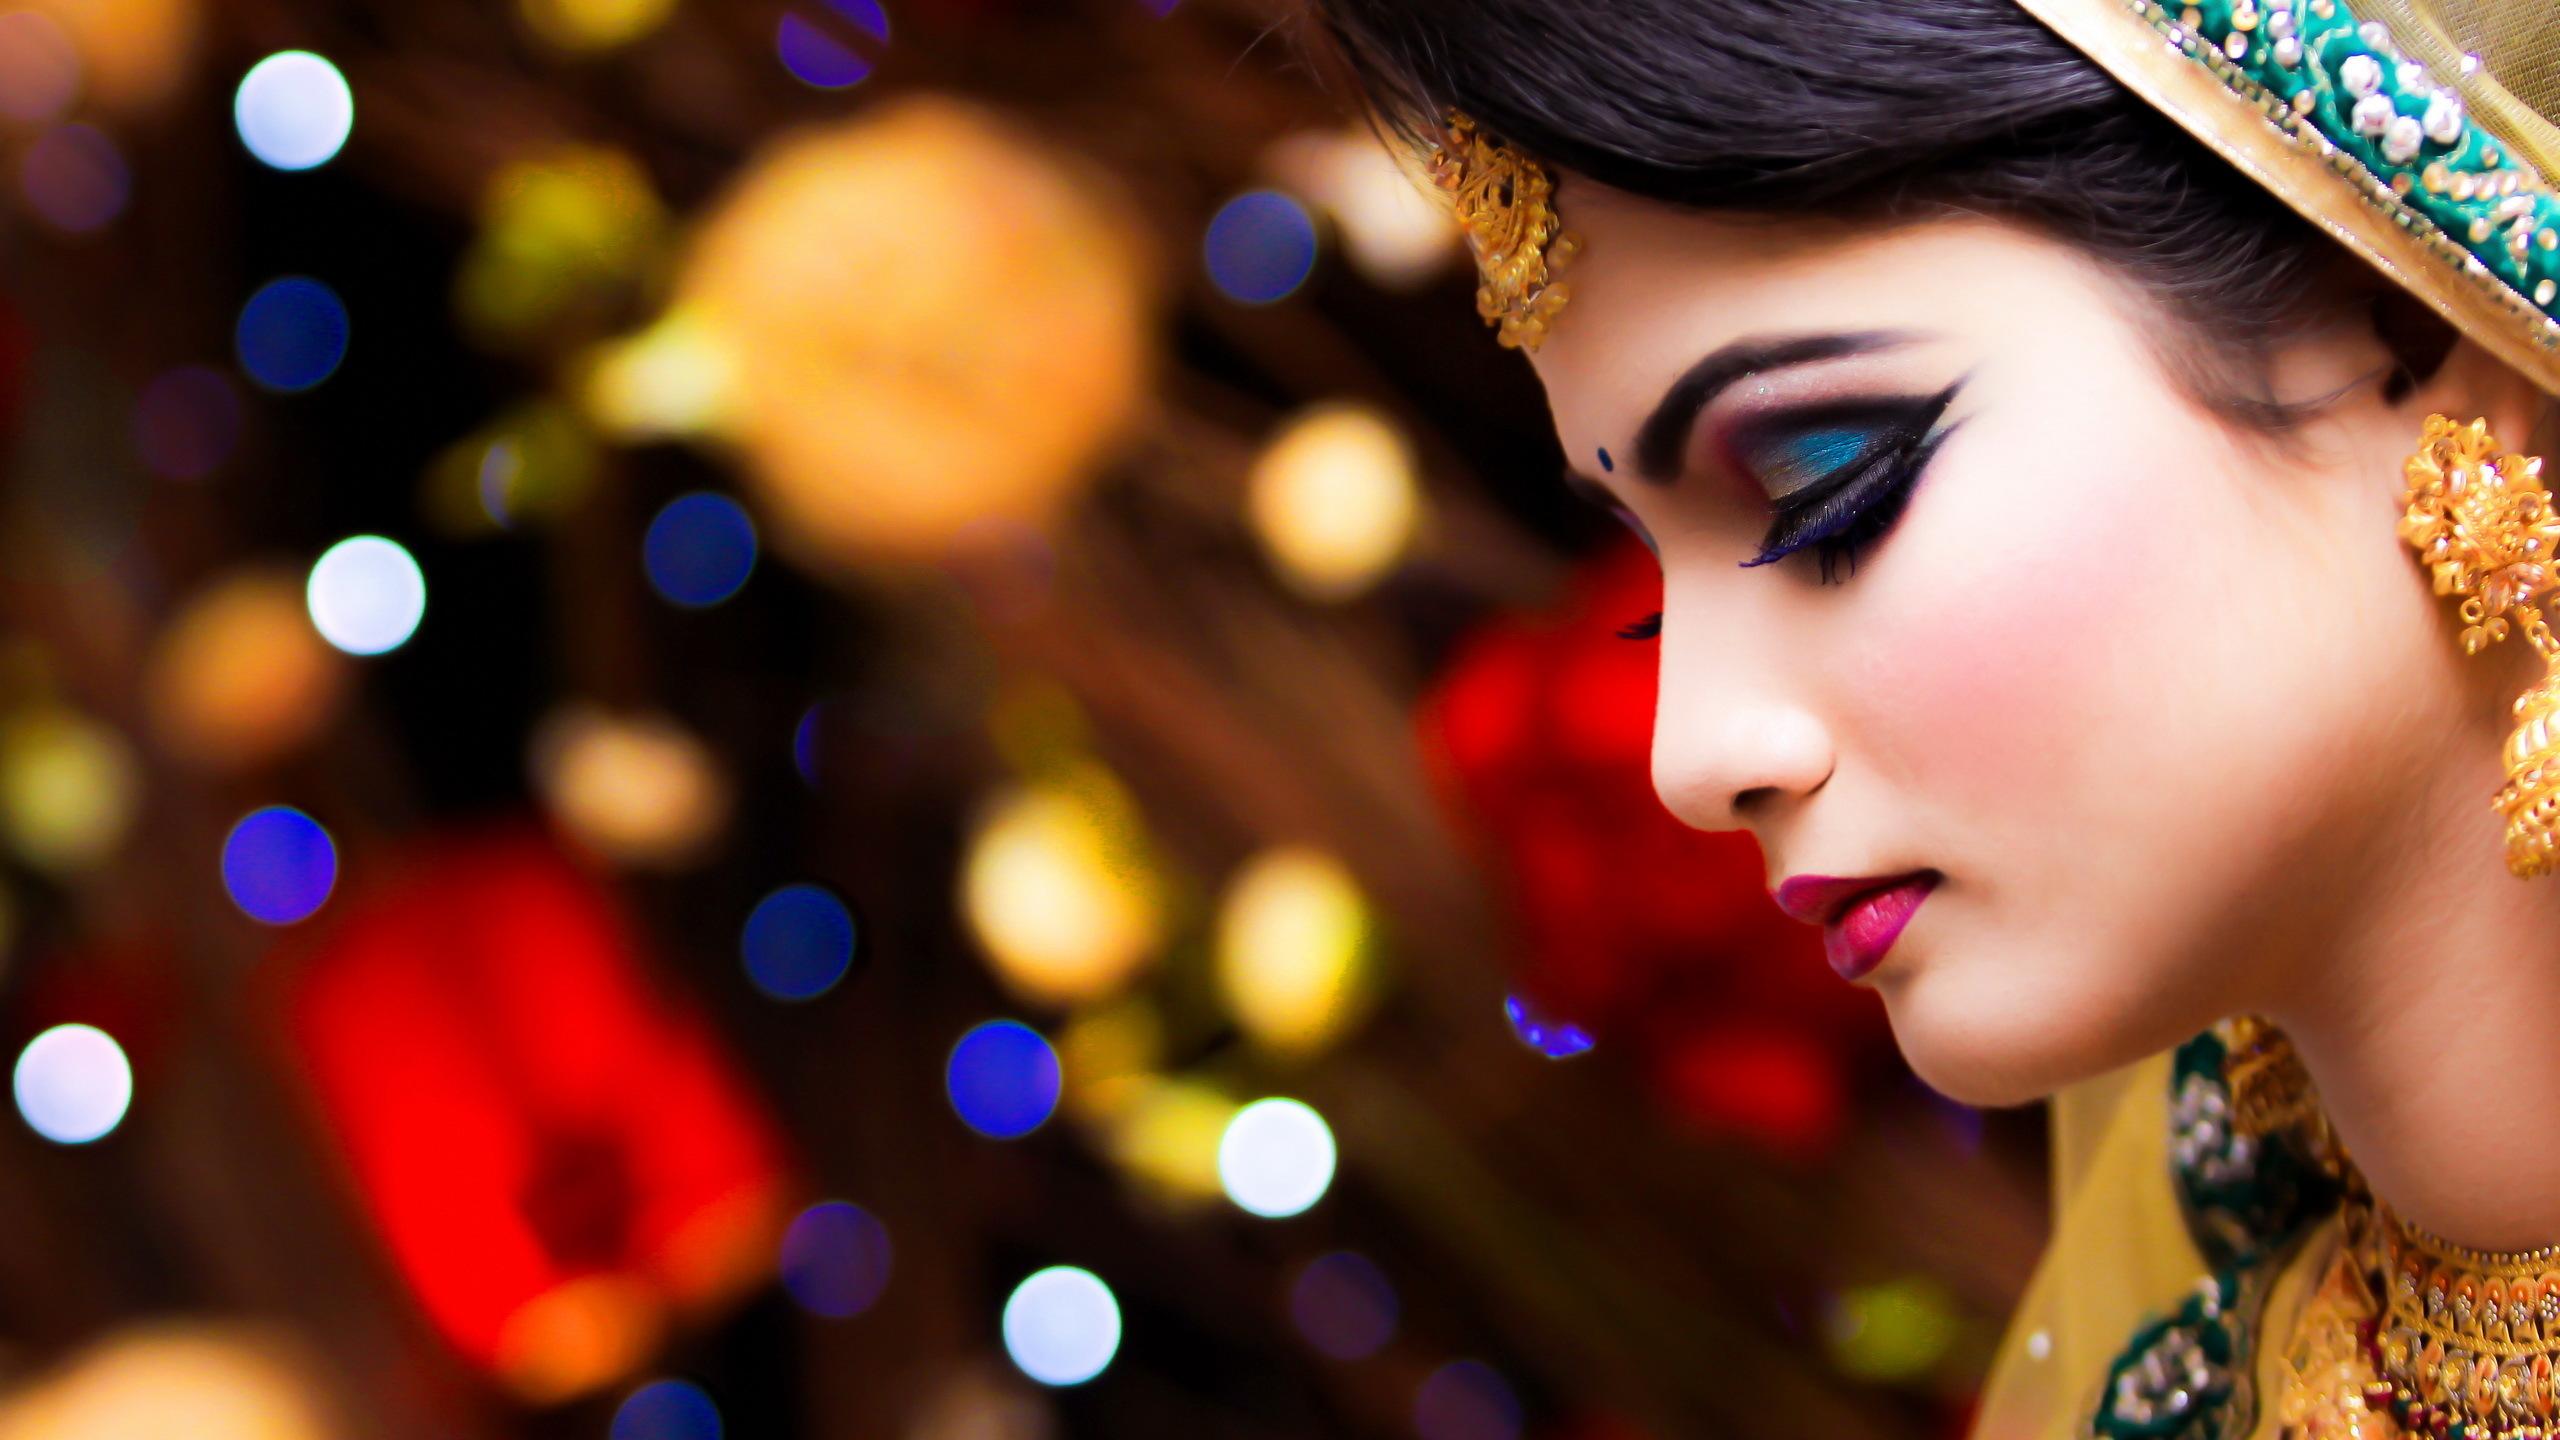 8ba1580d5368 ... Wedding Dress Woman Wreath · HD Wallpaper | Background Image ID:591240